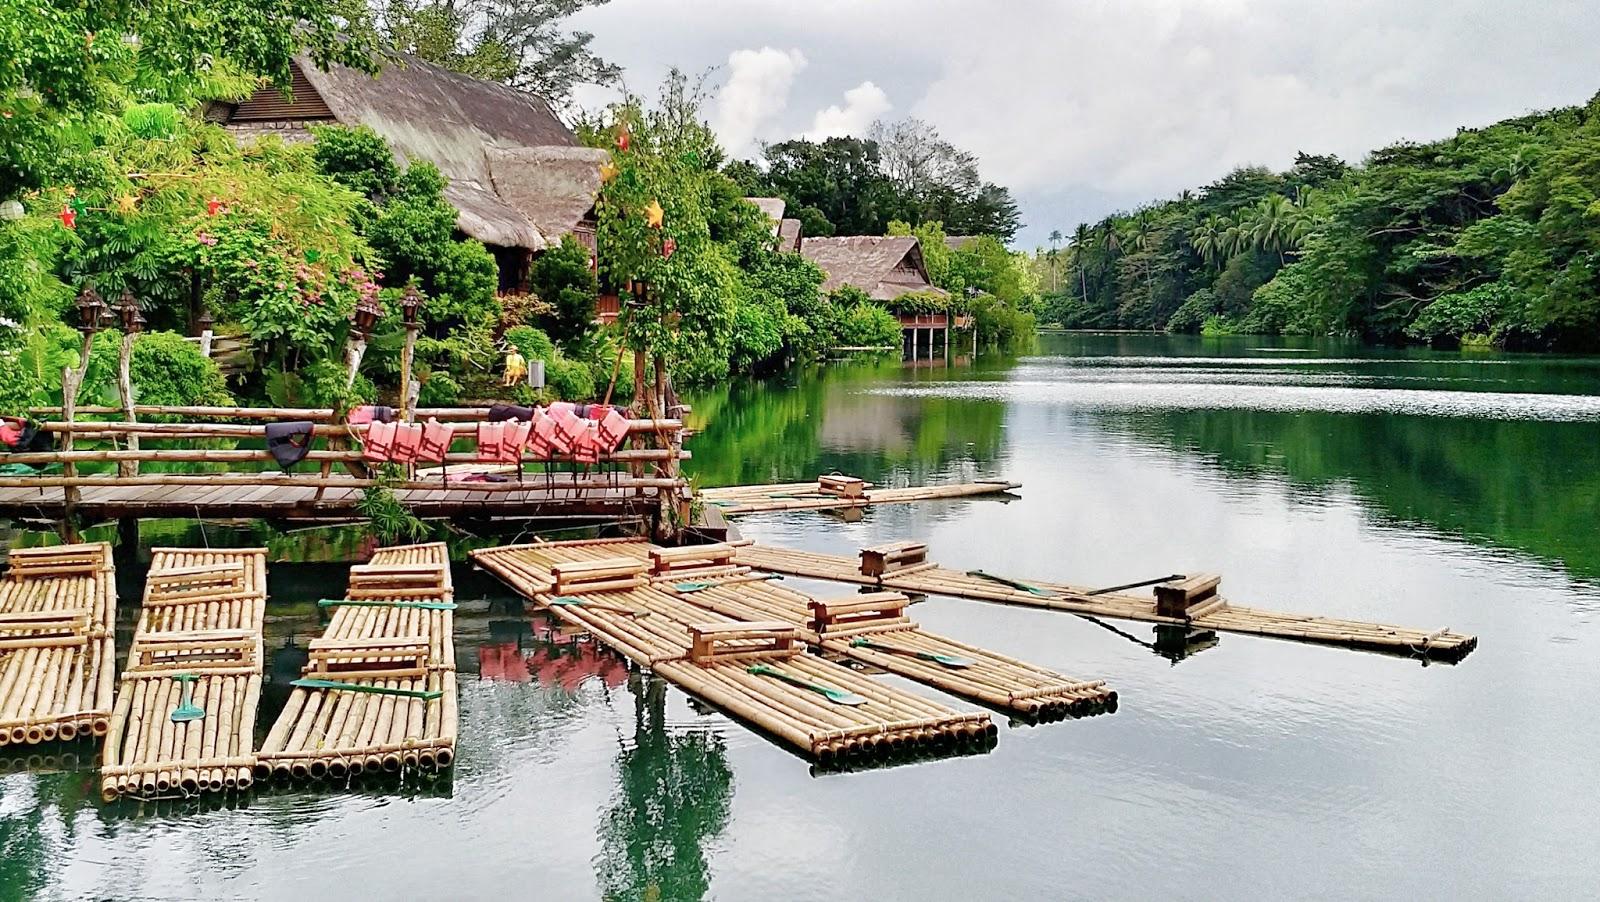 U Uu 2017 >> Villa Escudero Plantations & Resort : A Great Destination For Relaxation - The Pinoy Traveler